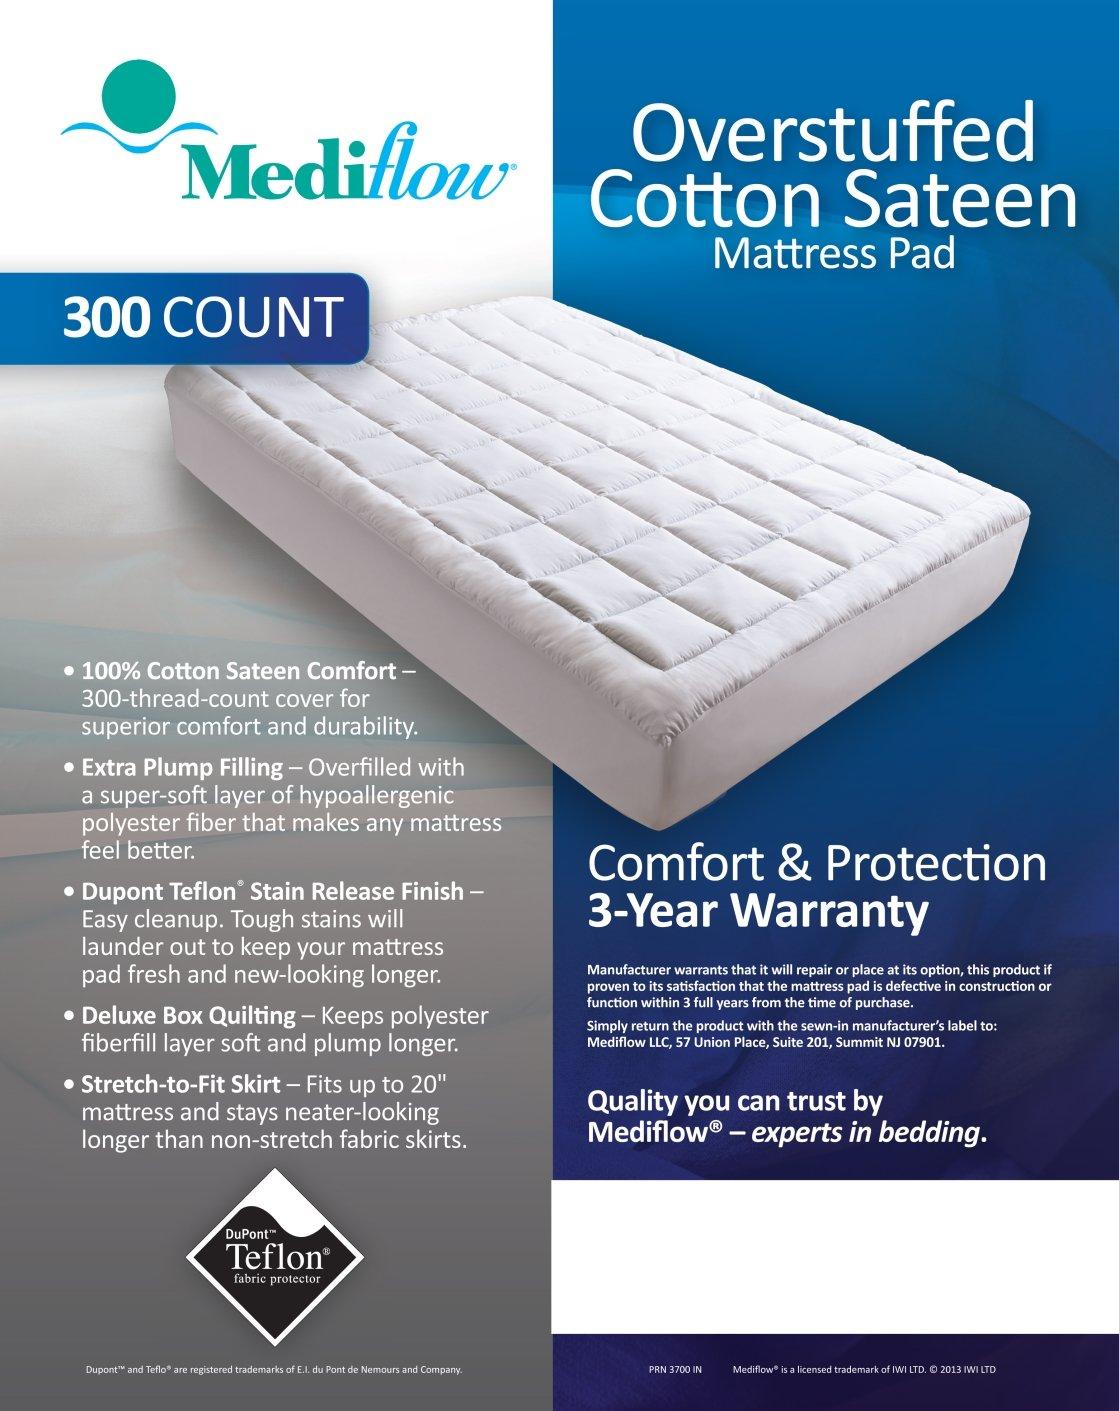 Queen 3704 Mediflow Overstuffed Cotton Sateen 60 by 80-Inch Mattress Pad